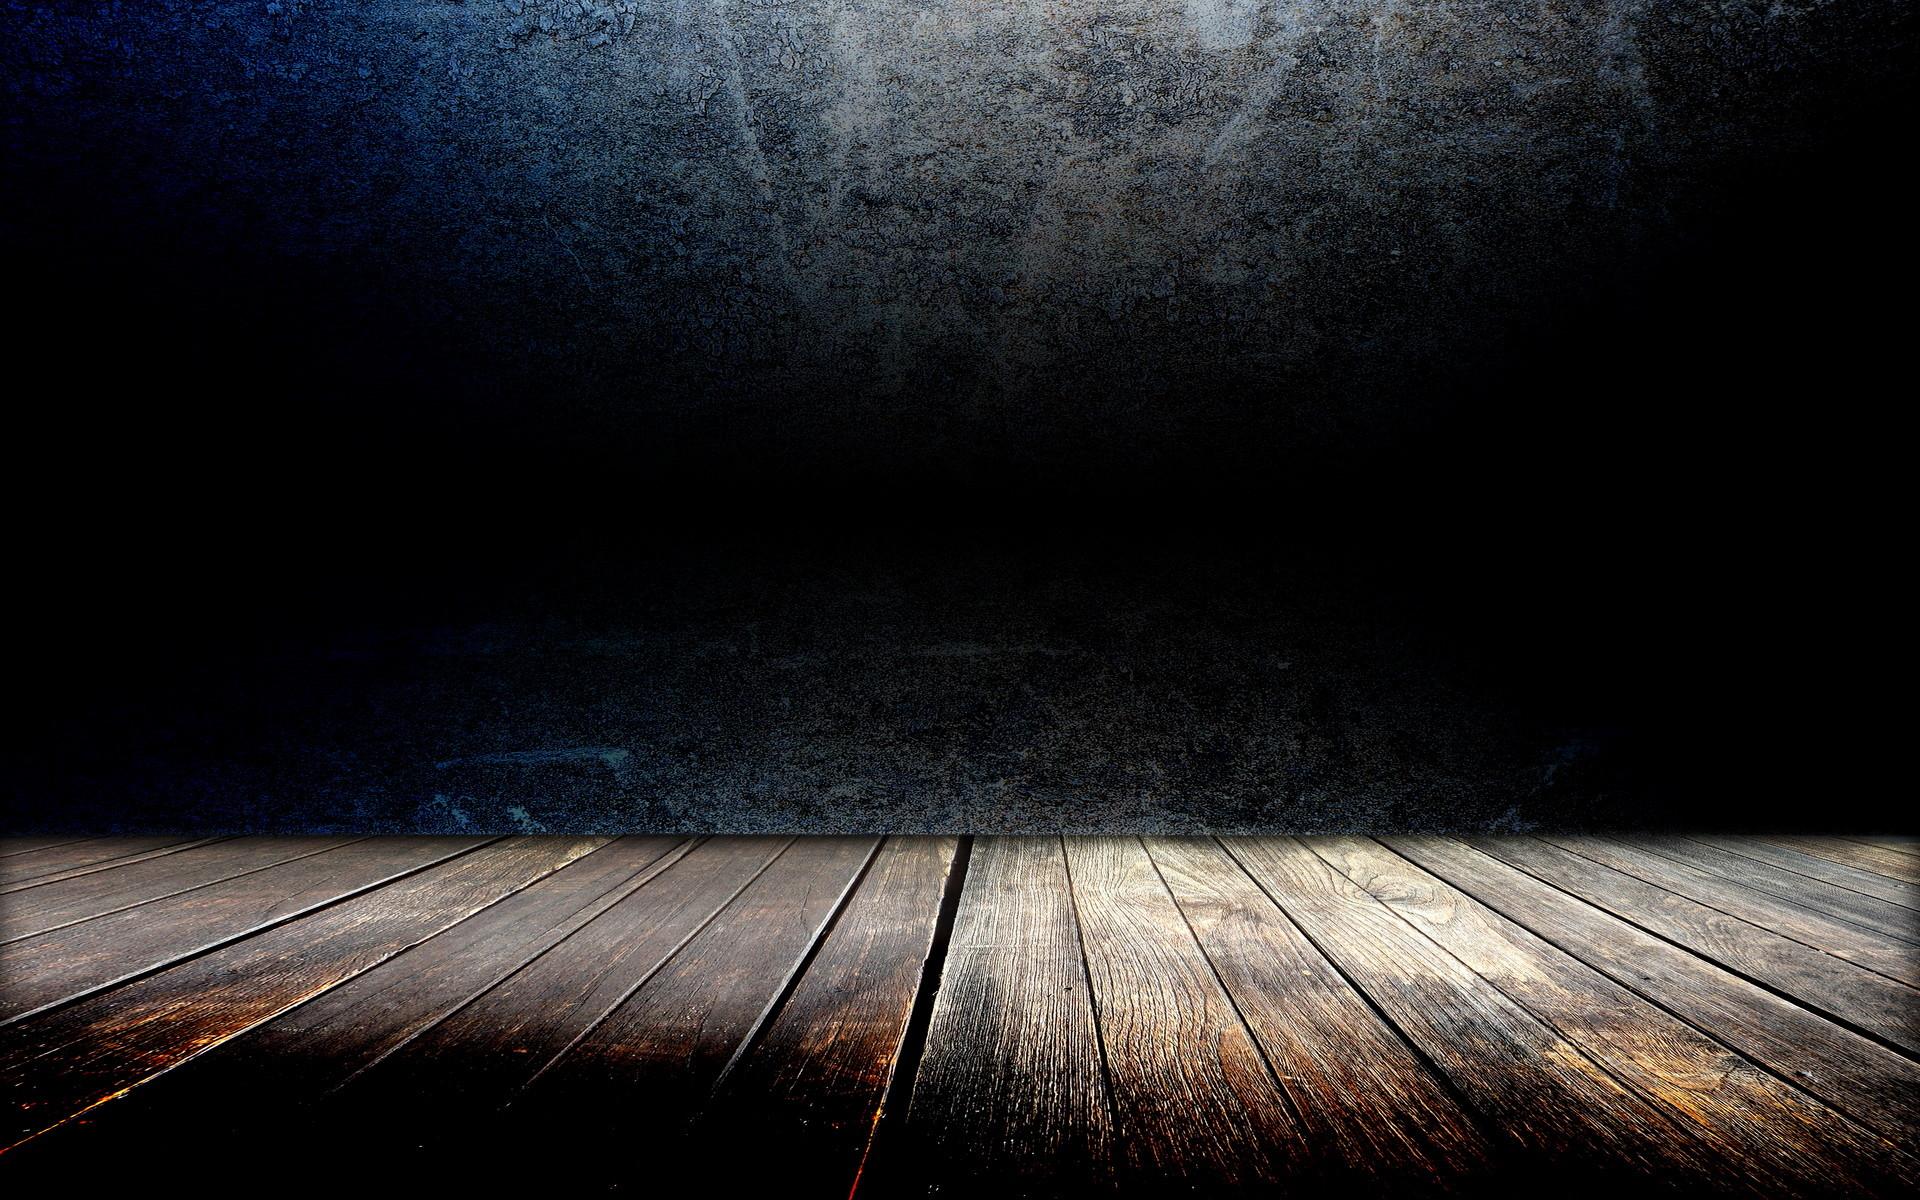 Definition-Wood Floor Wallpapers | Incredible Wood Floor Wallpapers